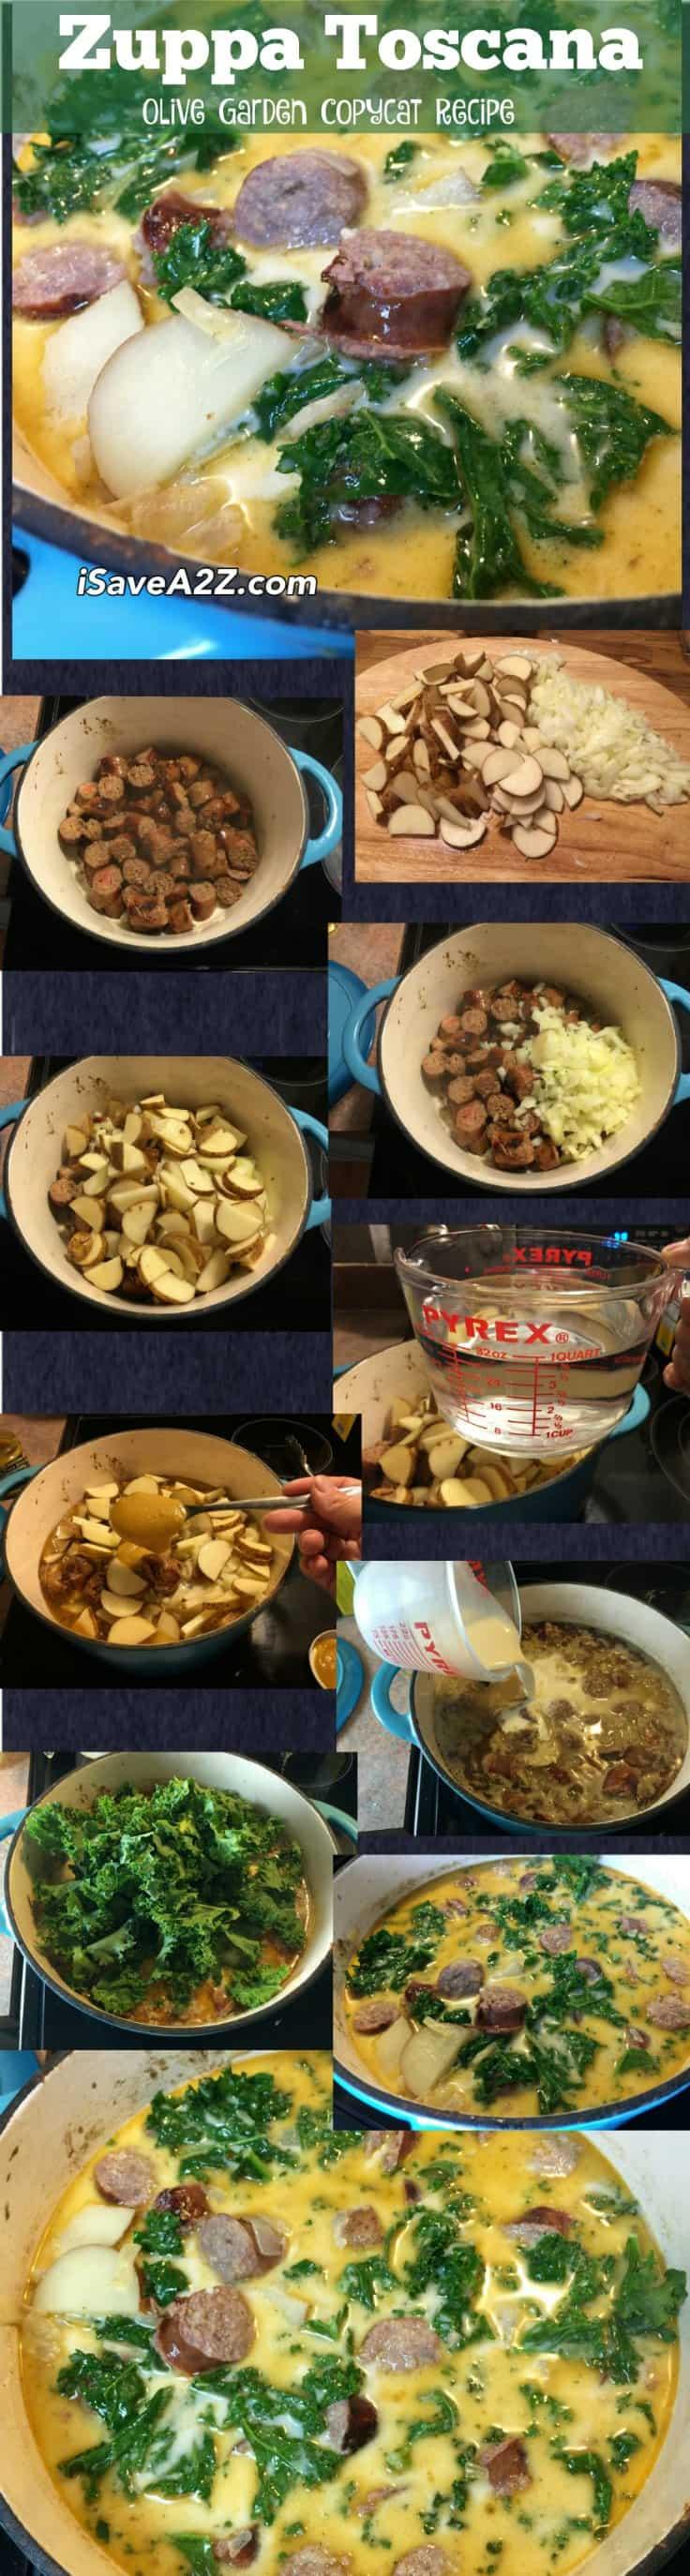 Zuppa Toscana Olive Garden Copycat Recipe